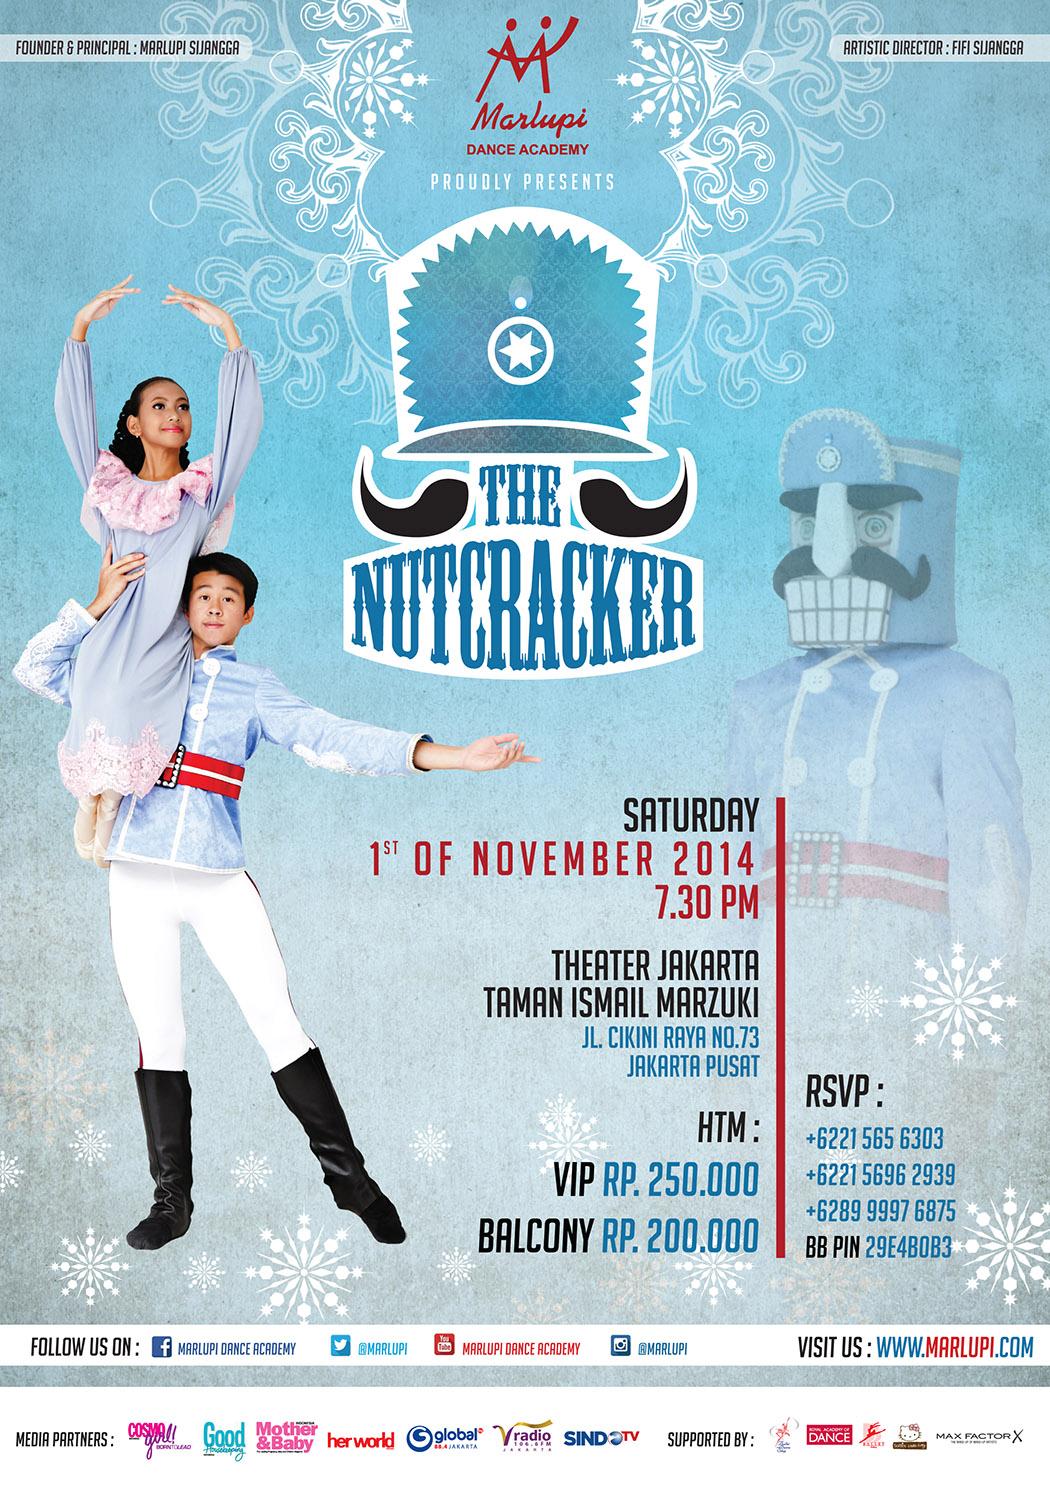 Marlupi Dance Academy - The Nutcracker 2014